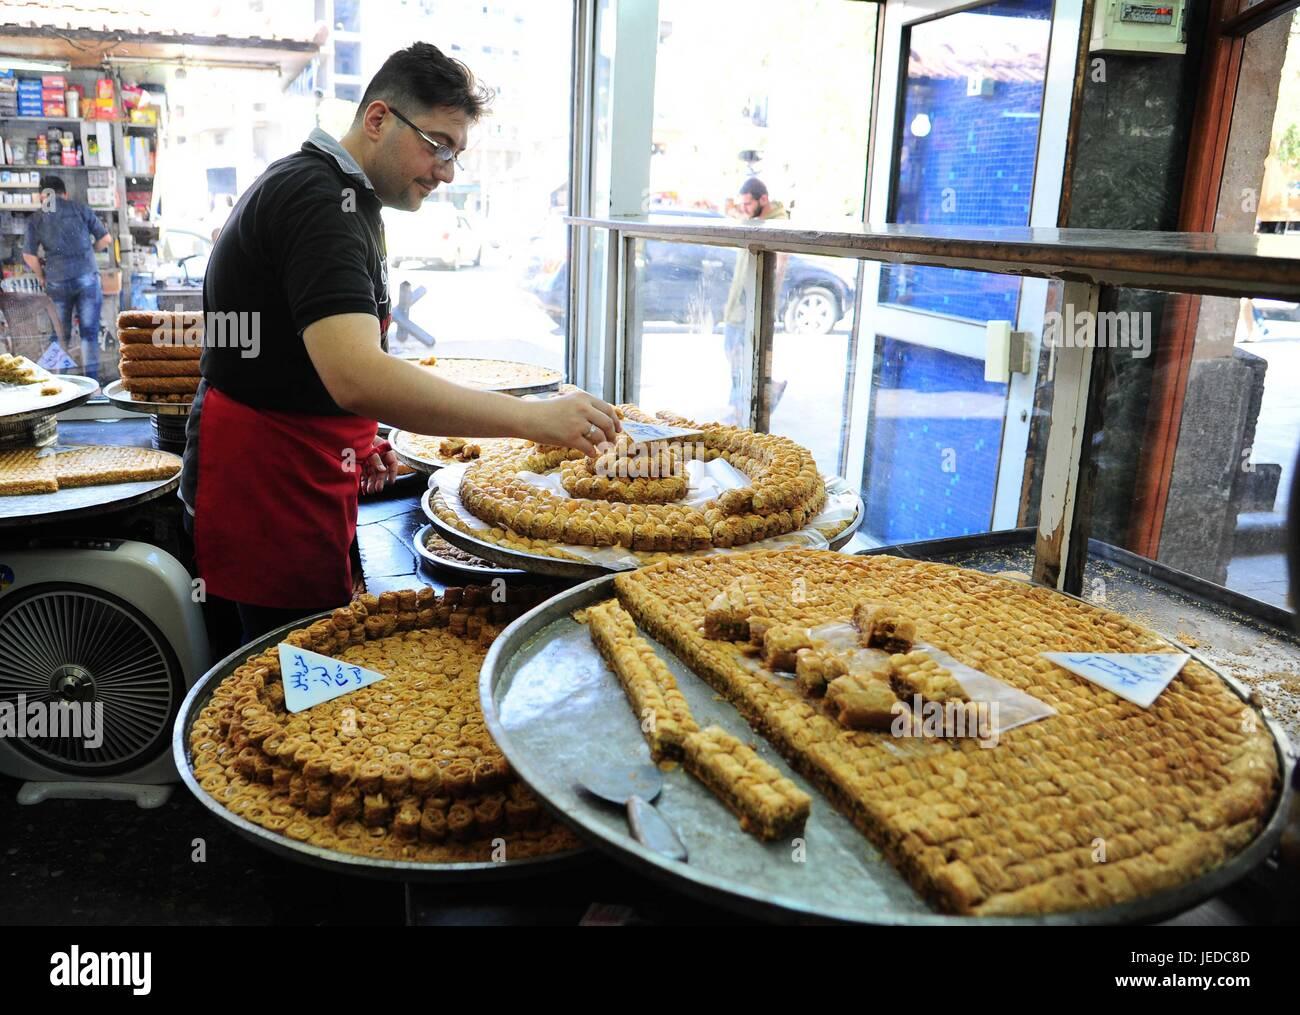 Wonderful Dessert Eid Al-Fitr Feast - damascus-syria-23rd-june-2017-a-sweet-maker-prepares-traditional-sweets-JEDC8D  Photograph_495636 .jpg